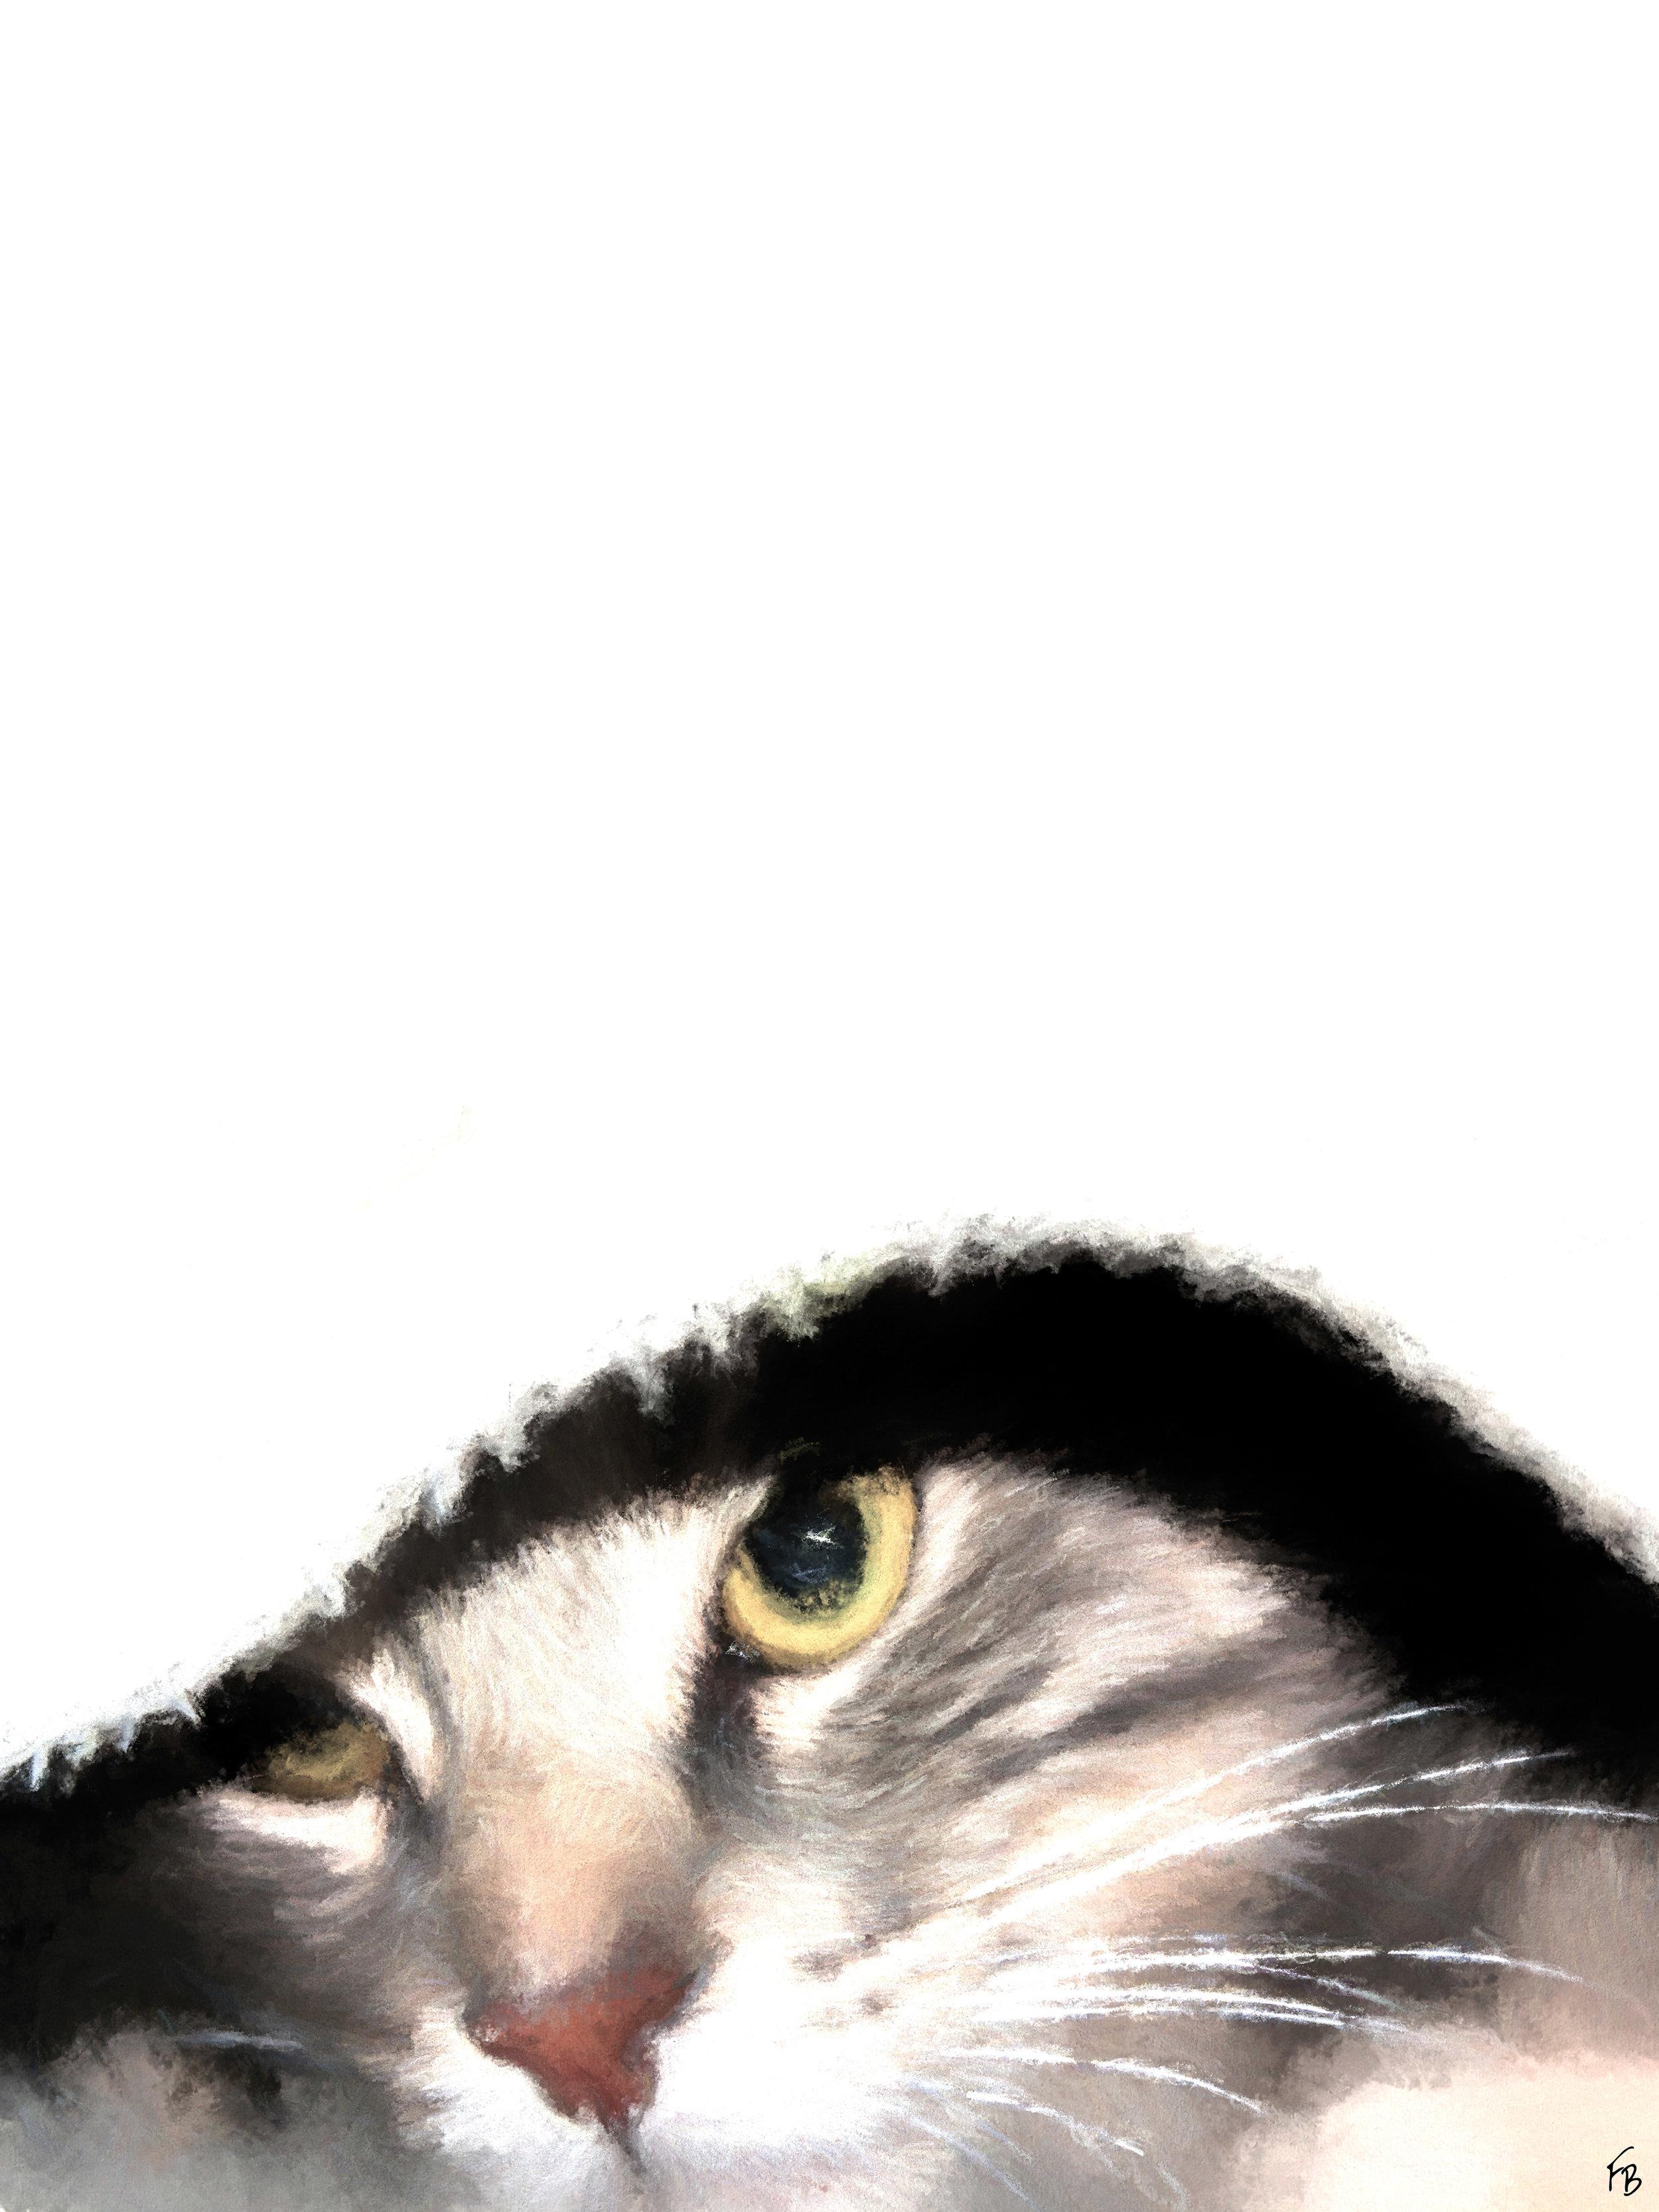 Spritz undercover